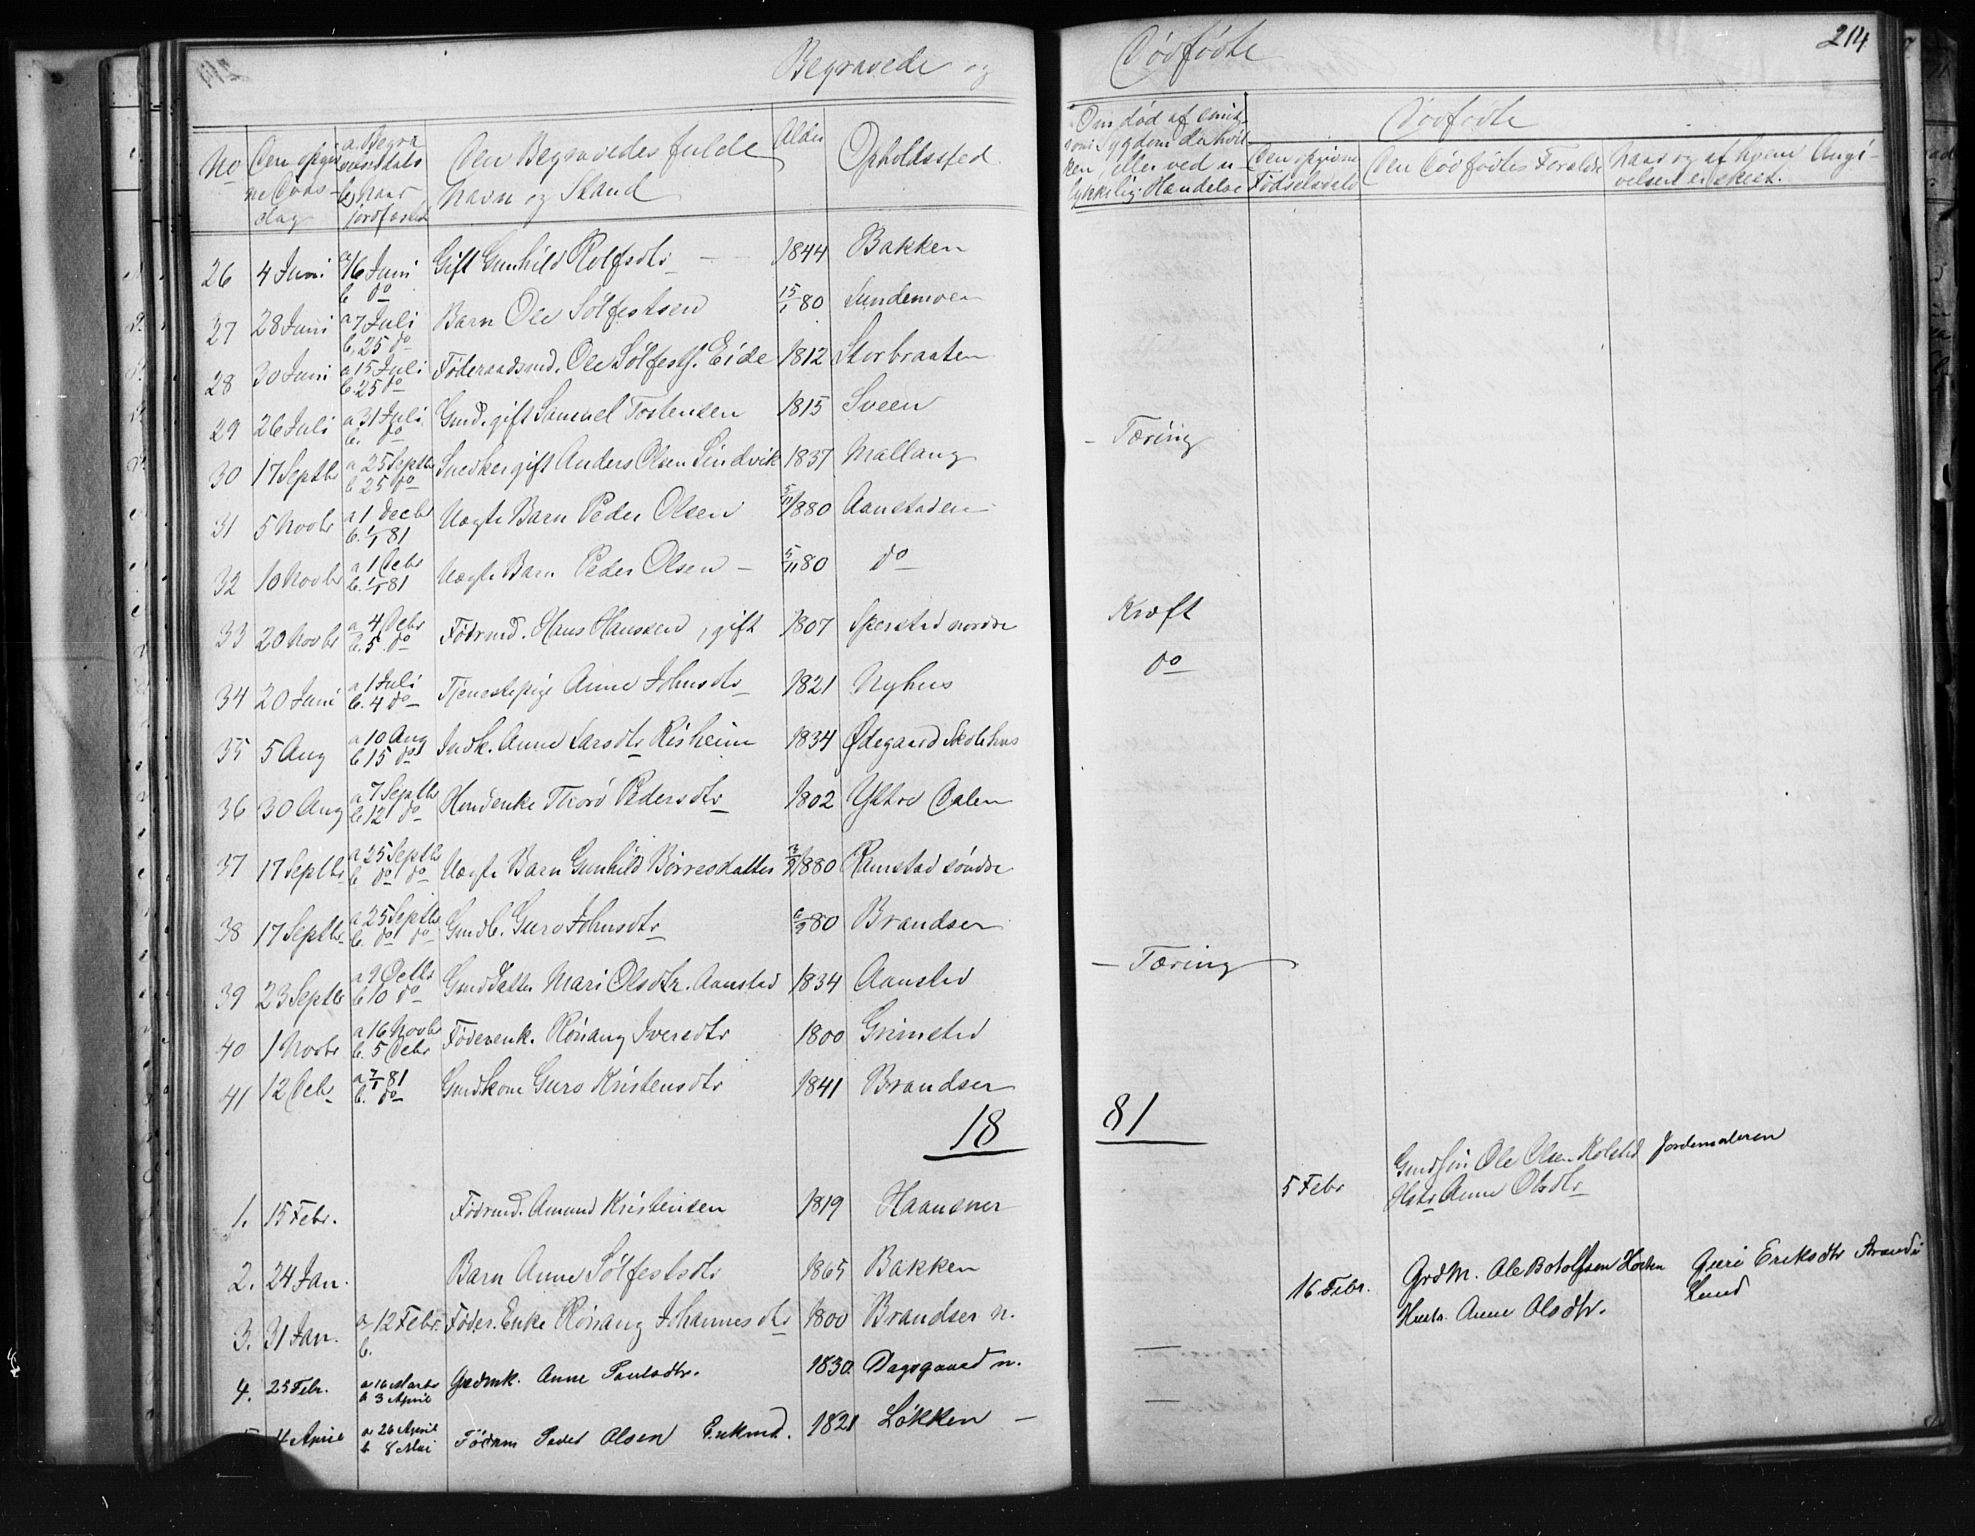 SAH, Skjåk prestekontor, Klokkerbok nr. 1, 1865-1893, s. 214